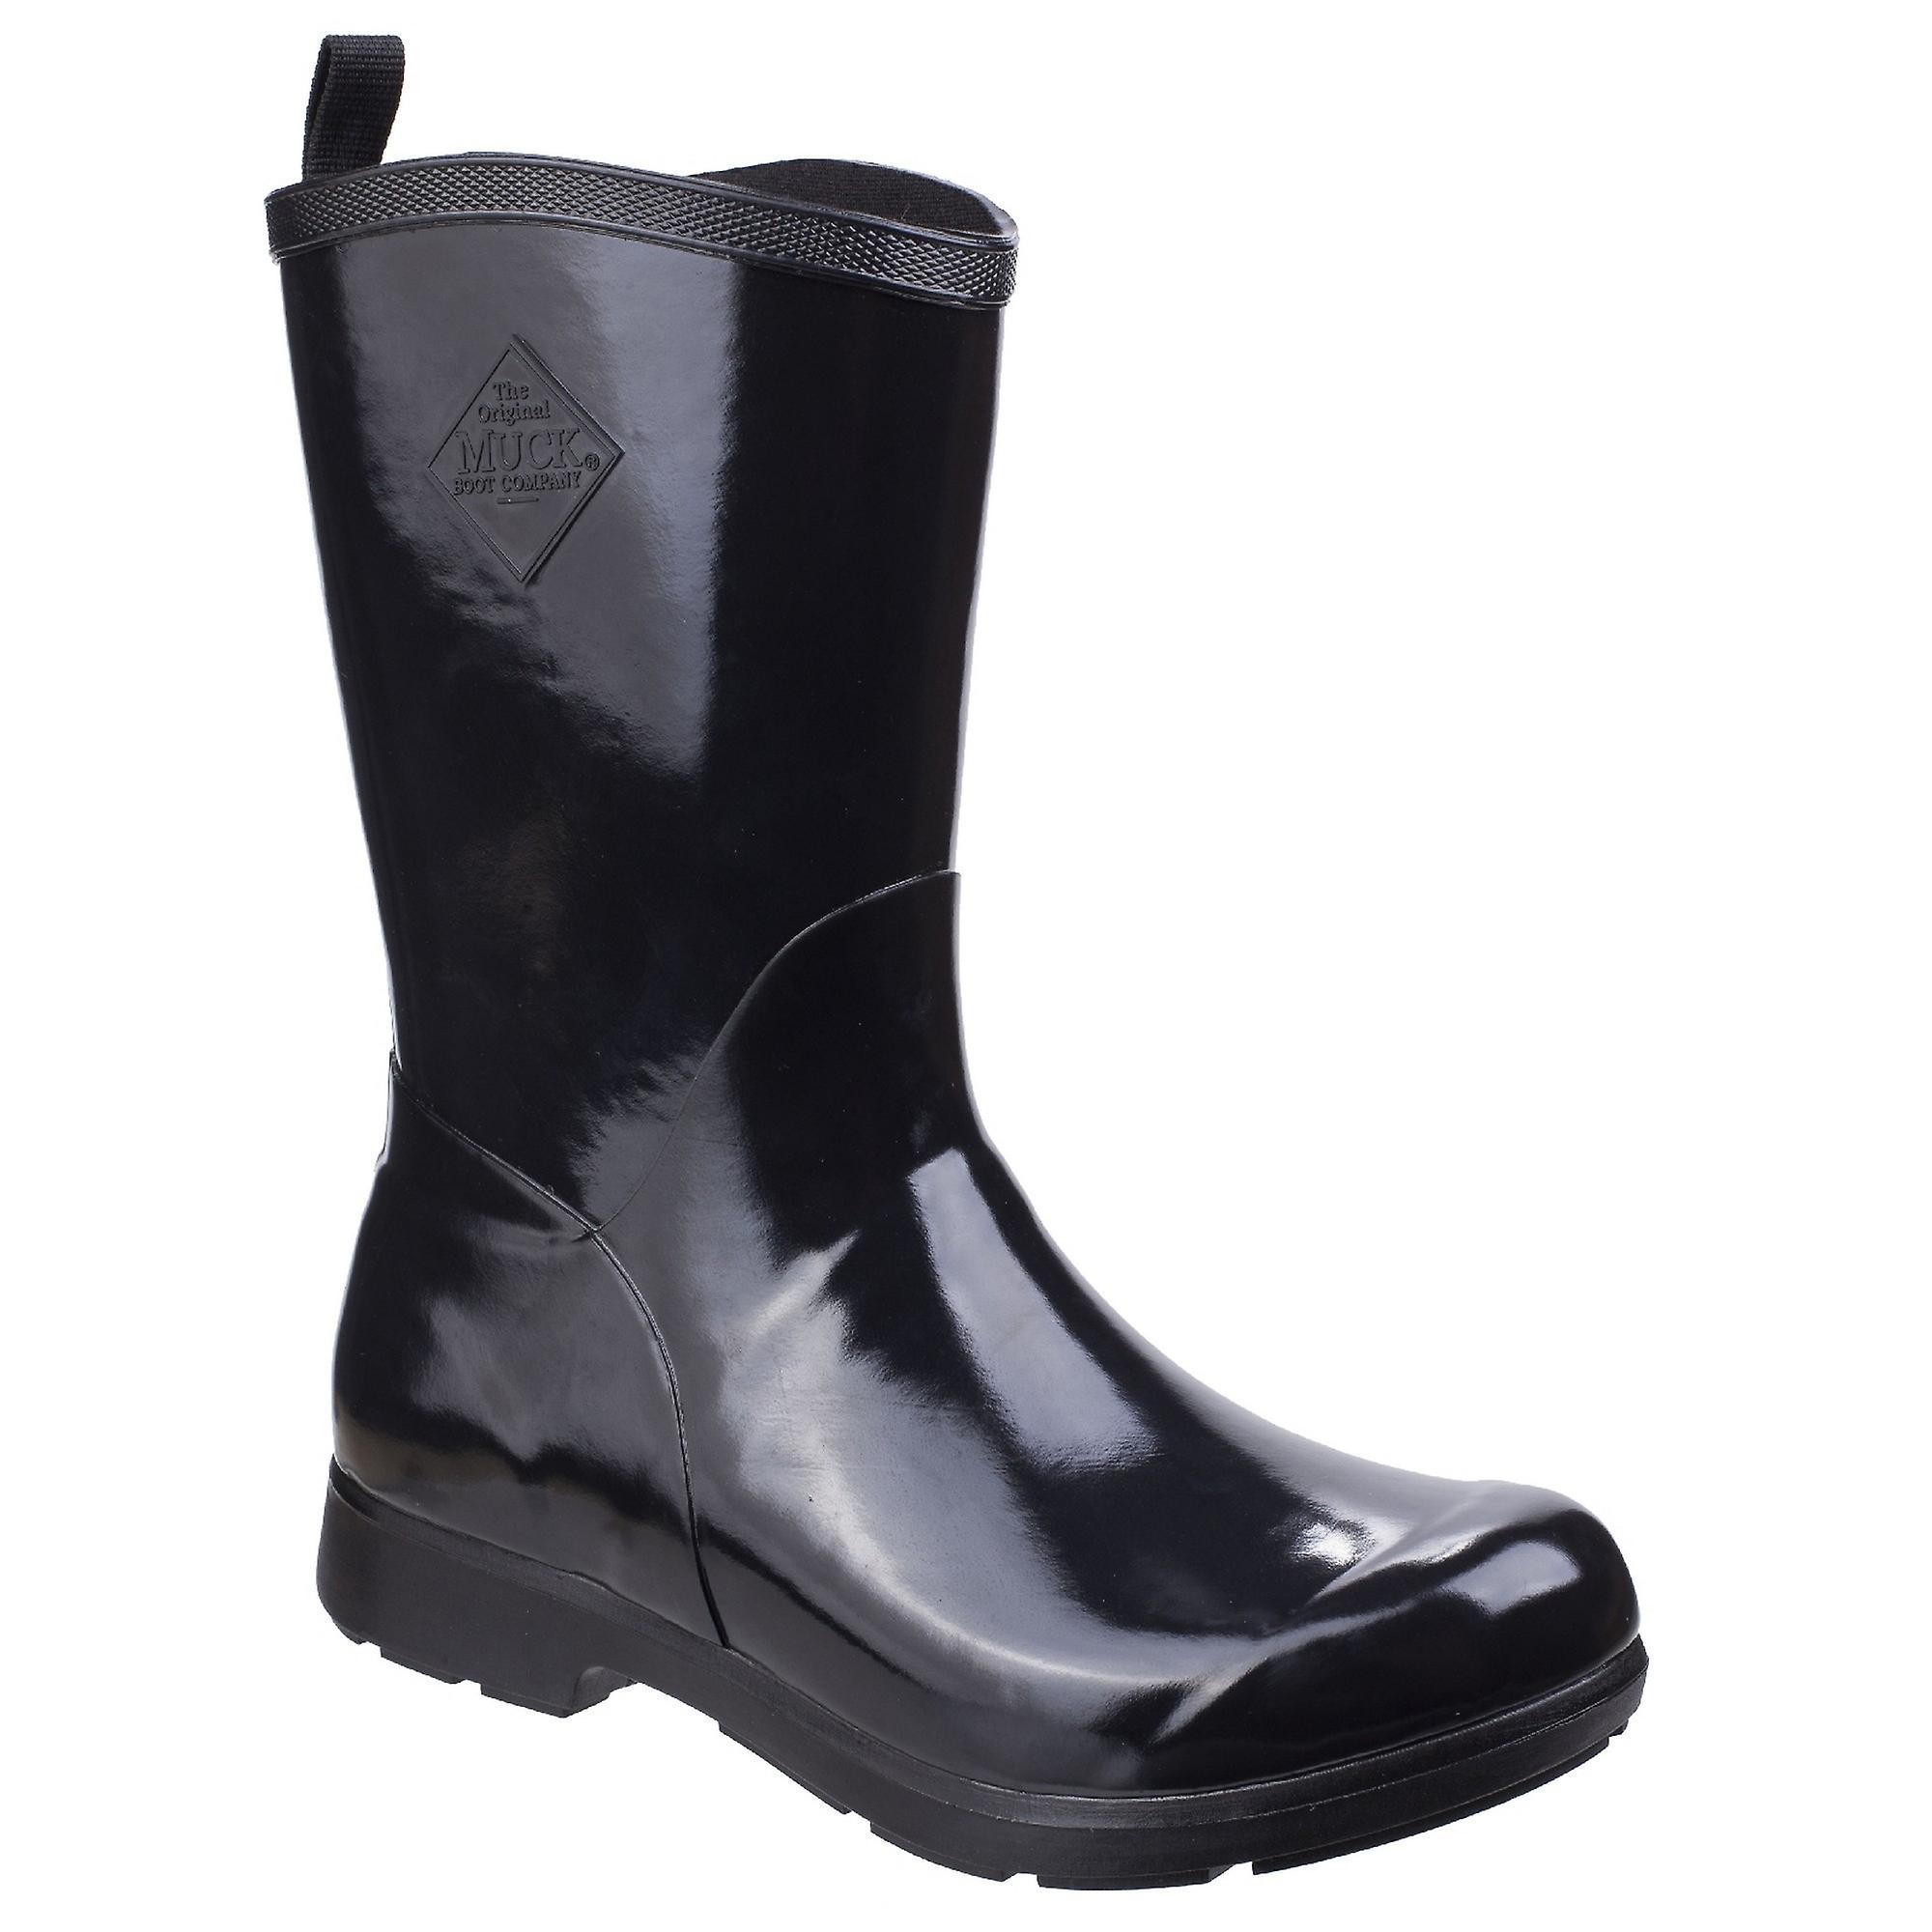 Muck laarzen Womensdames Bergen midden lichtgewicht regen laarzen